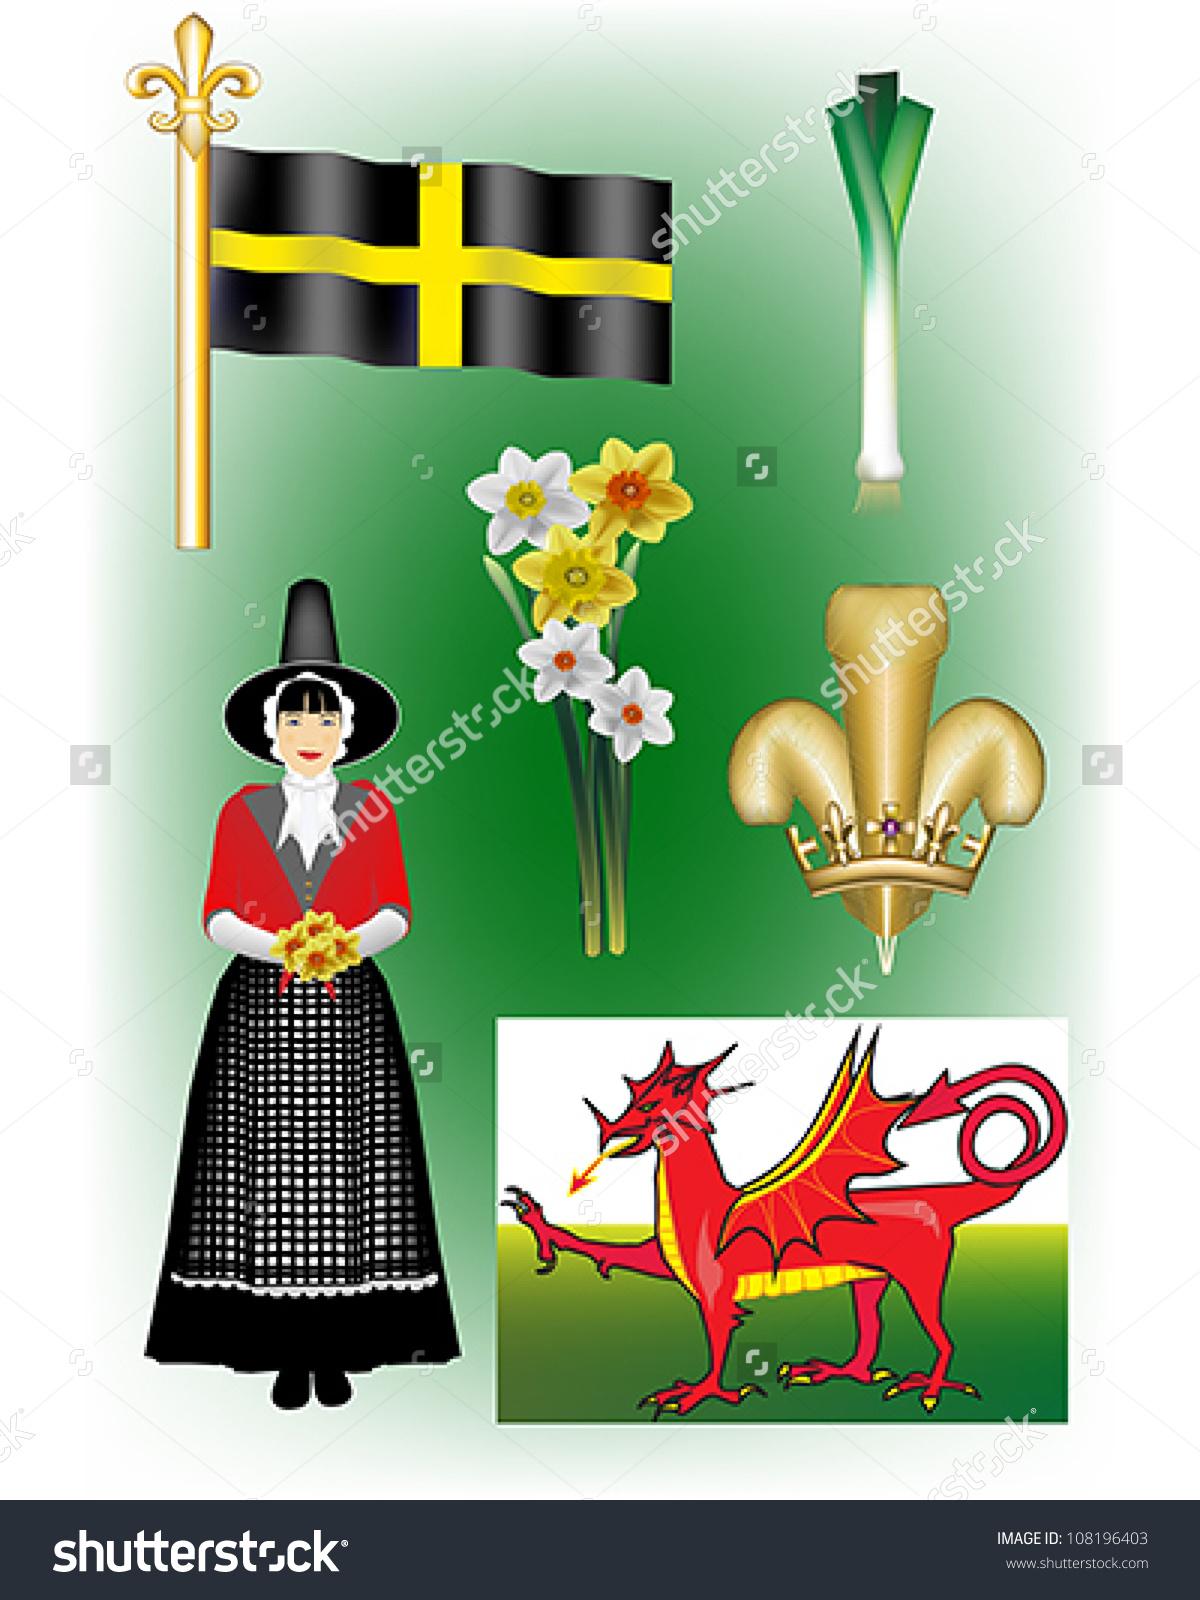 Welsh Vector Illustrations St Davids Flag Stock Vector 108196403.